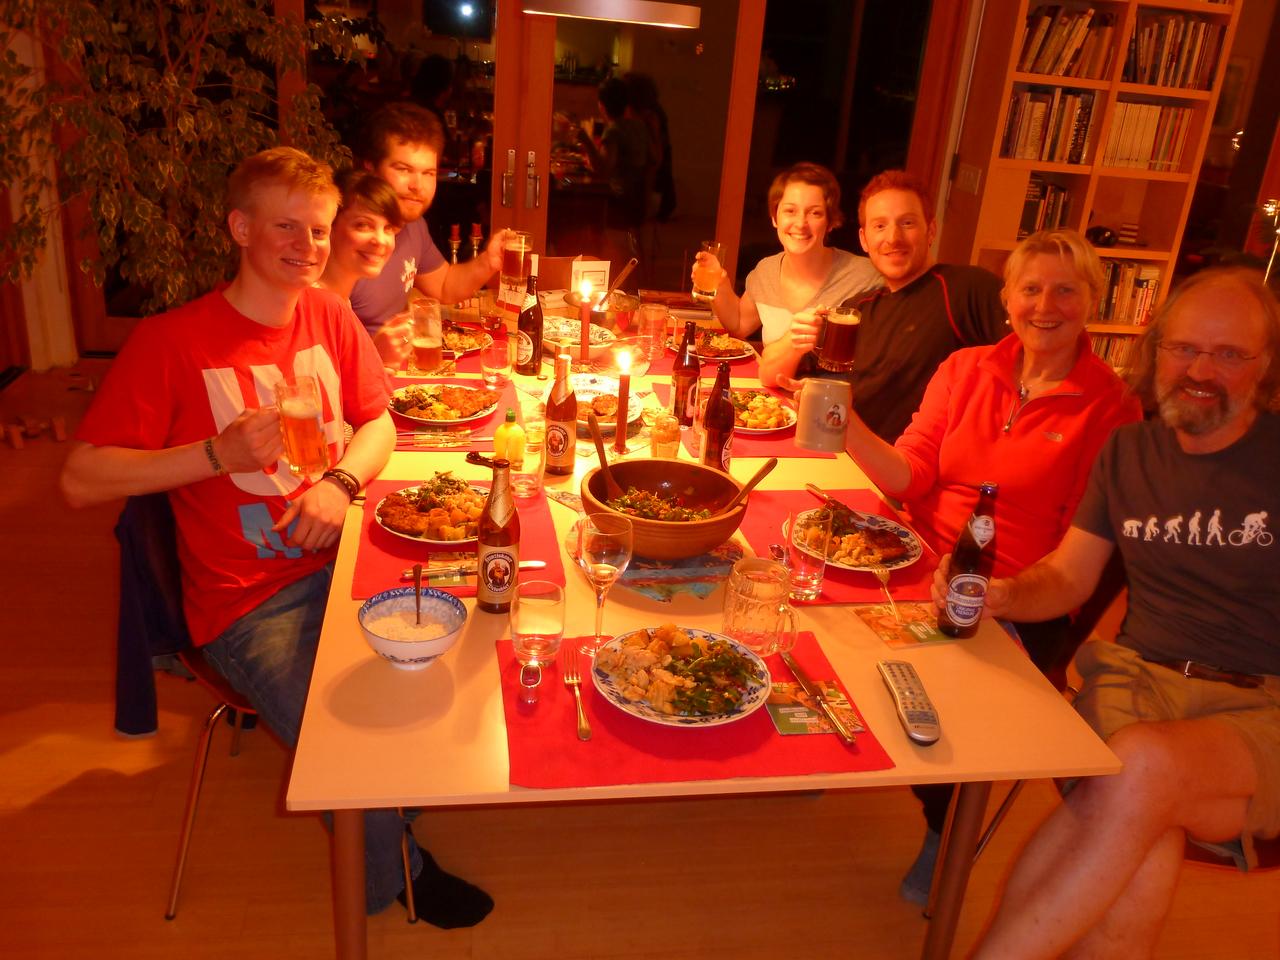 The amazing Schnitzel dinner!!!